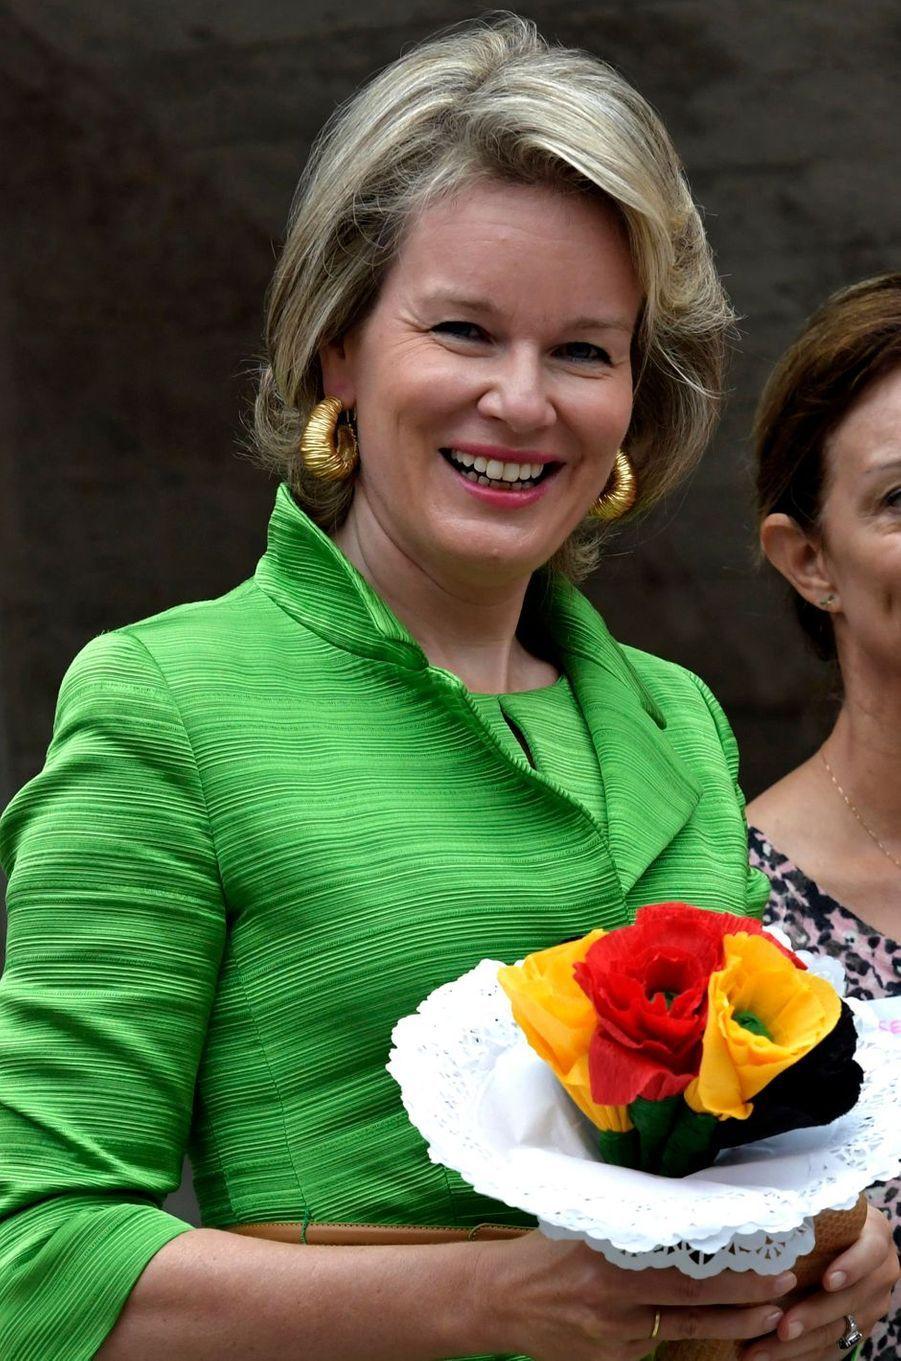 La reine Mathilde de Belgique à Oostduinkerke, le 4 septembre 2018